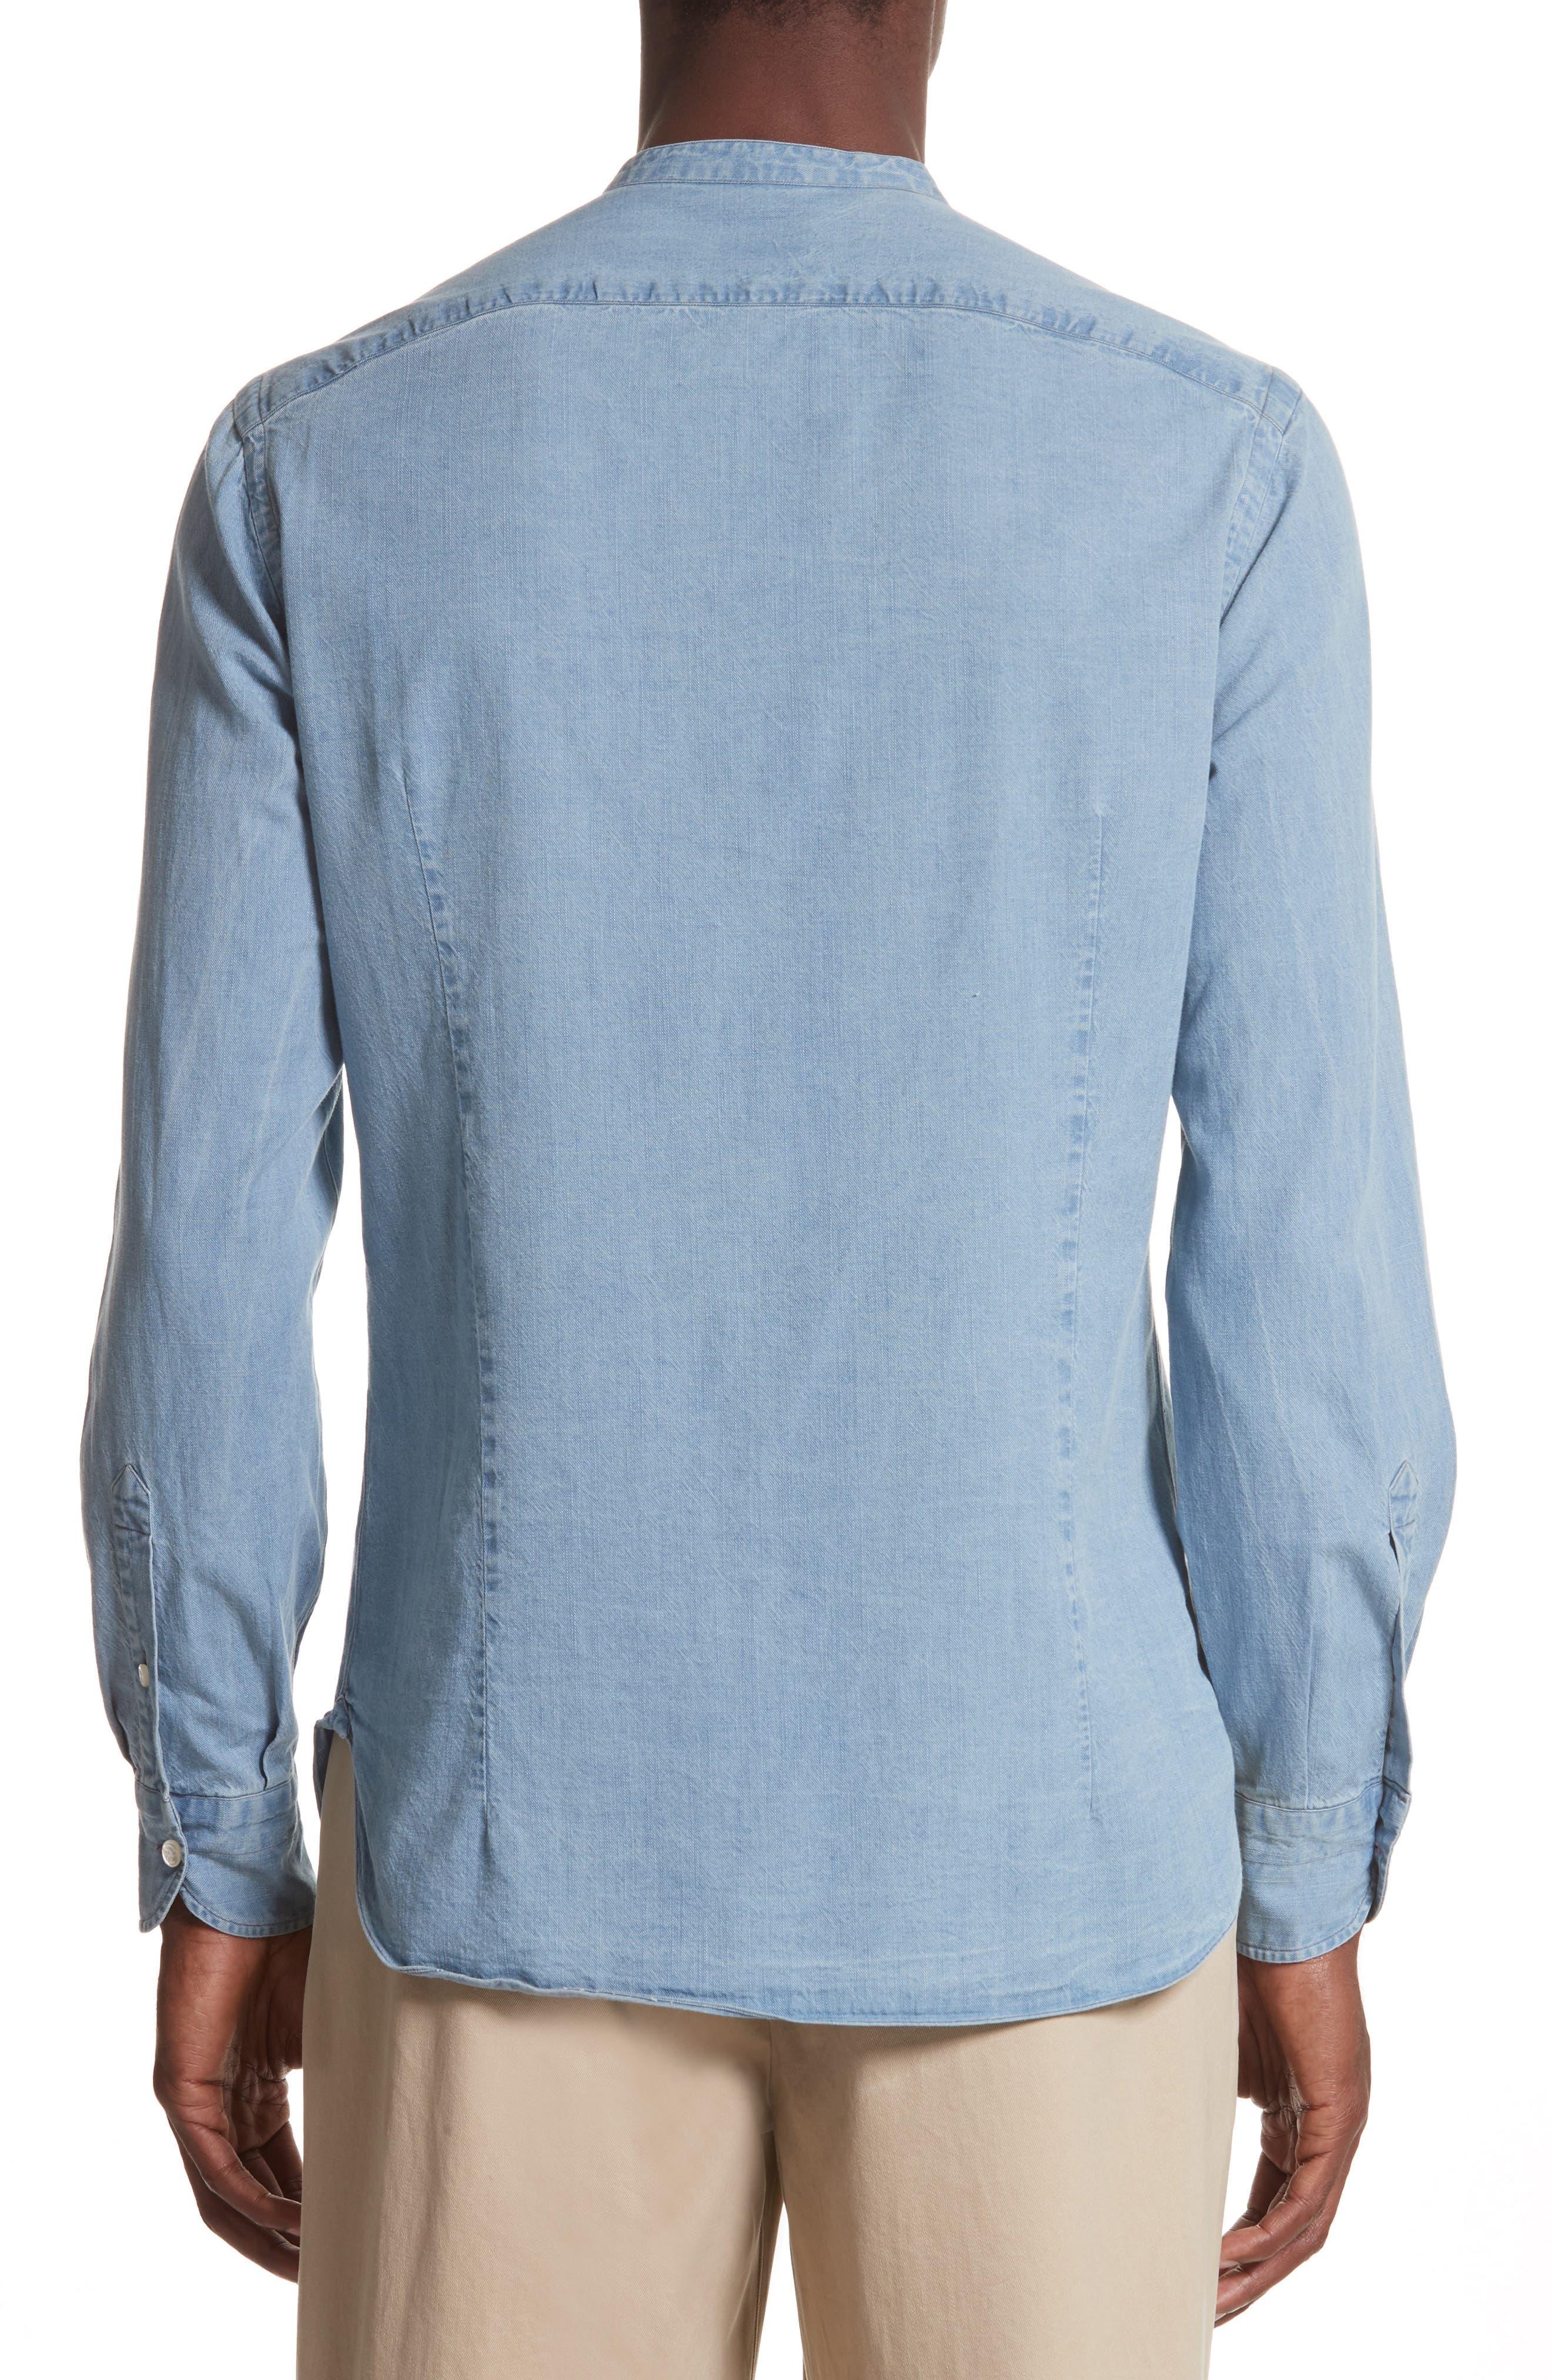 Napoli Washed Denim Band Collar Shirt,                             Alternate thumbnail 2, color,                             451